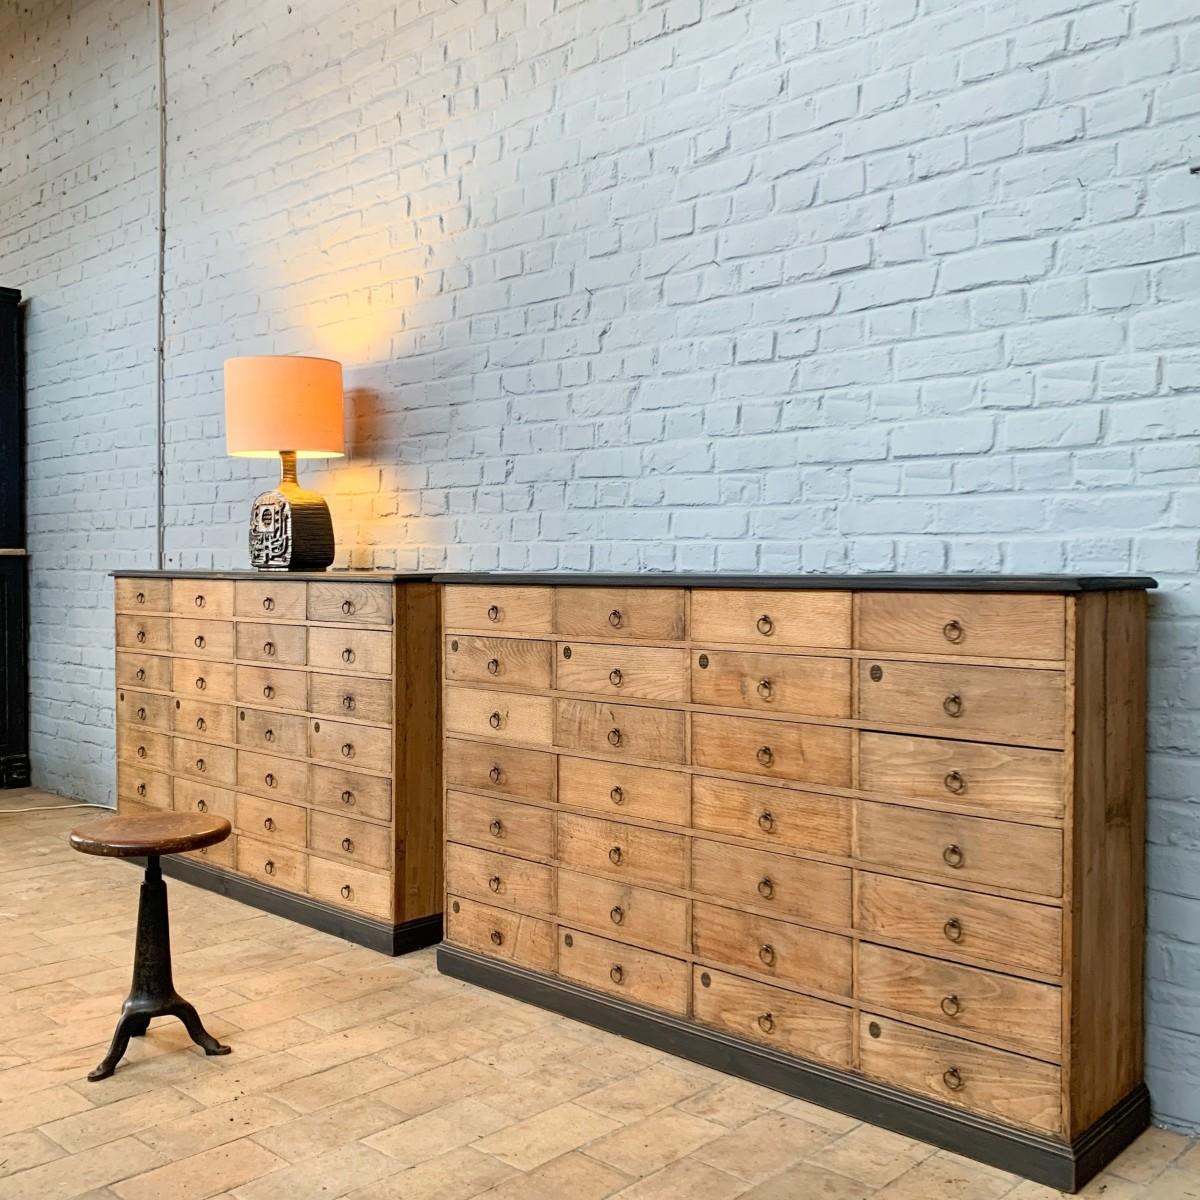 Pair of French oak hardware furniture